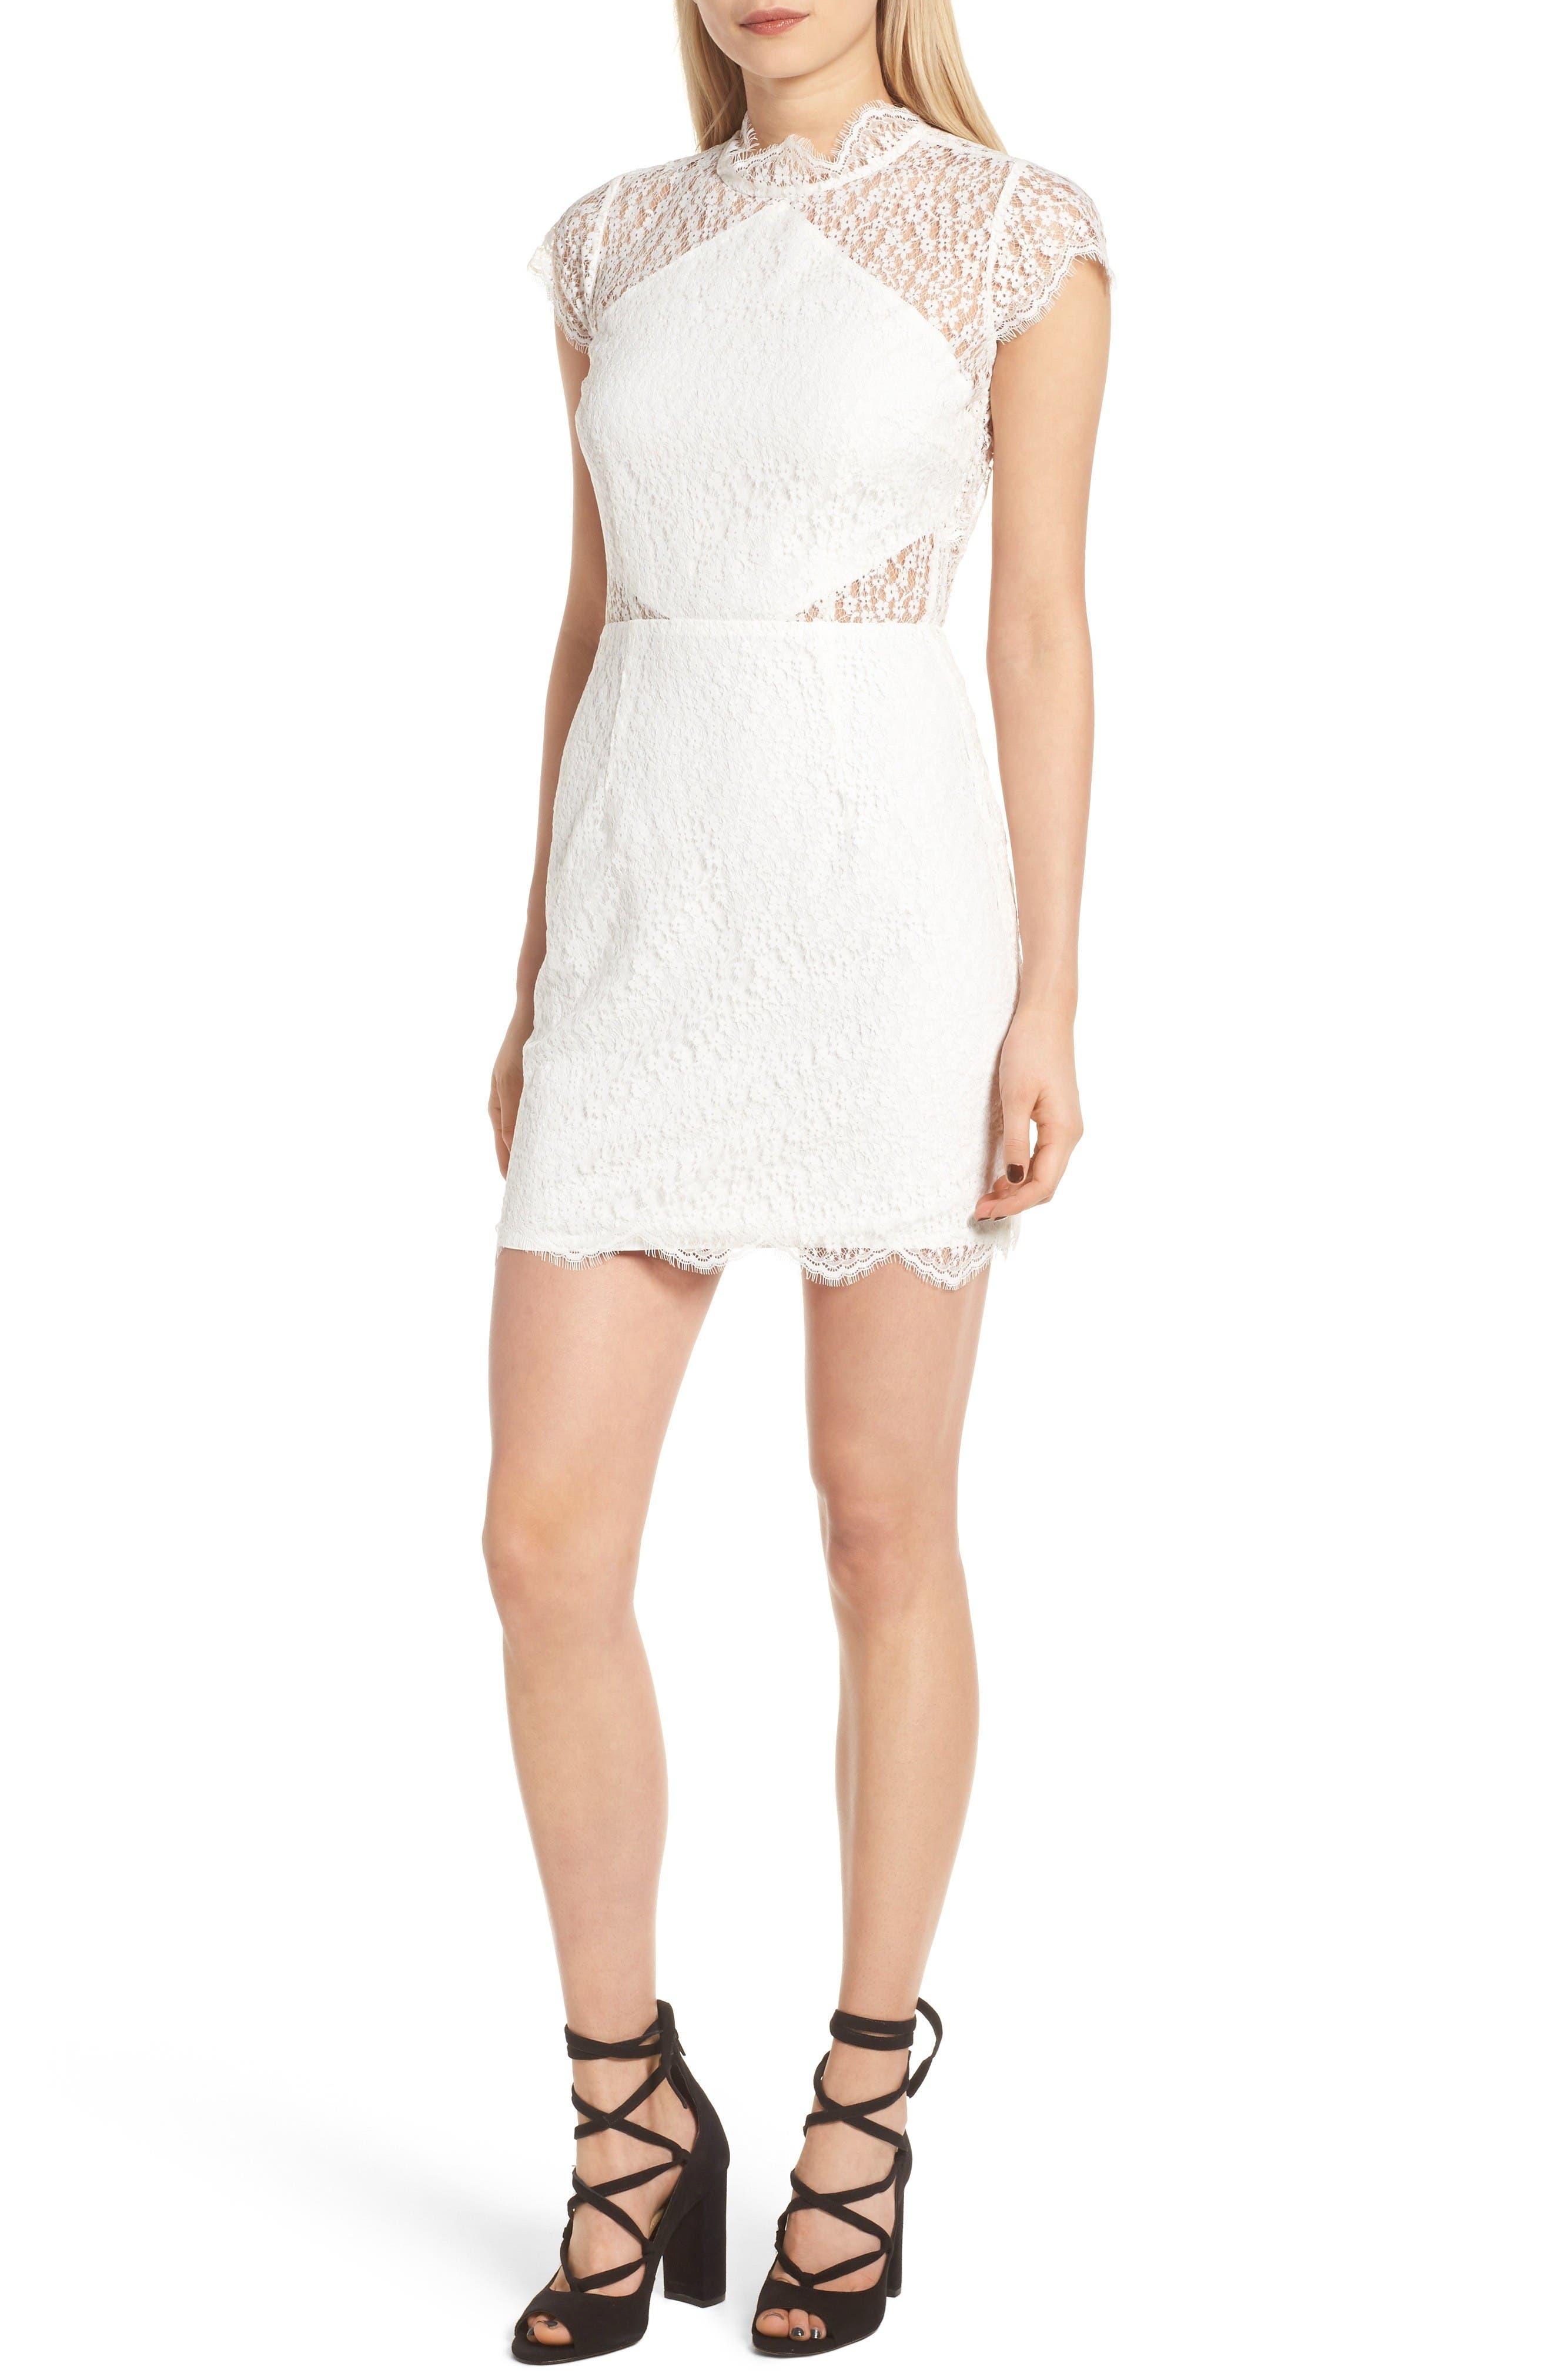 Alternate Image 1 Selected - Keepsake the Label Daydream Lace Minidress